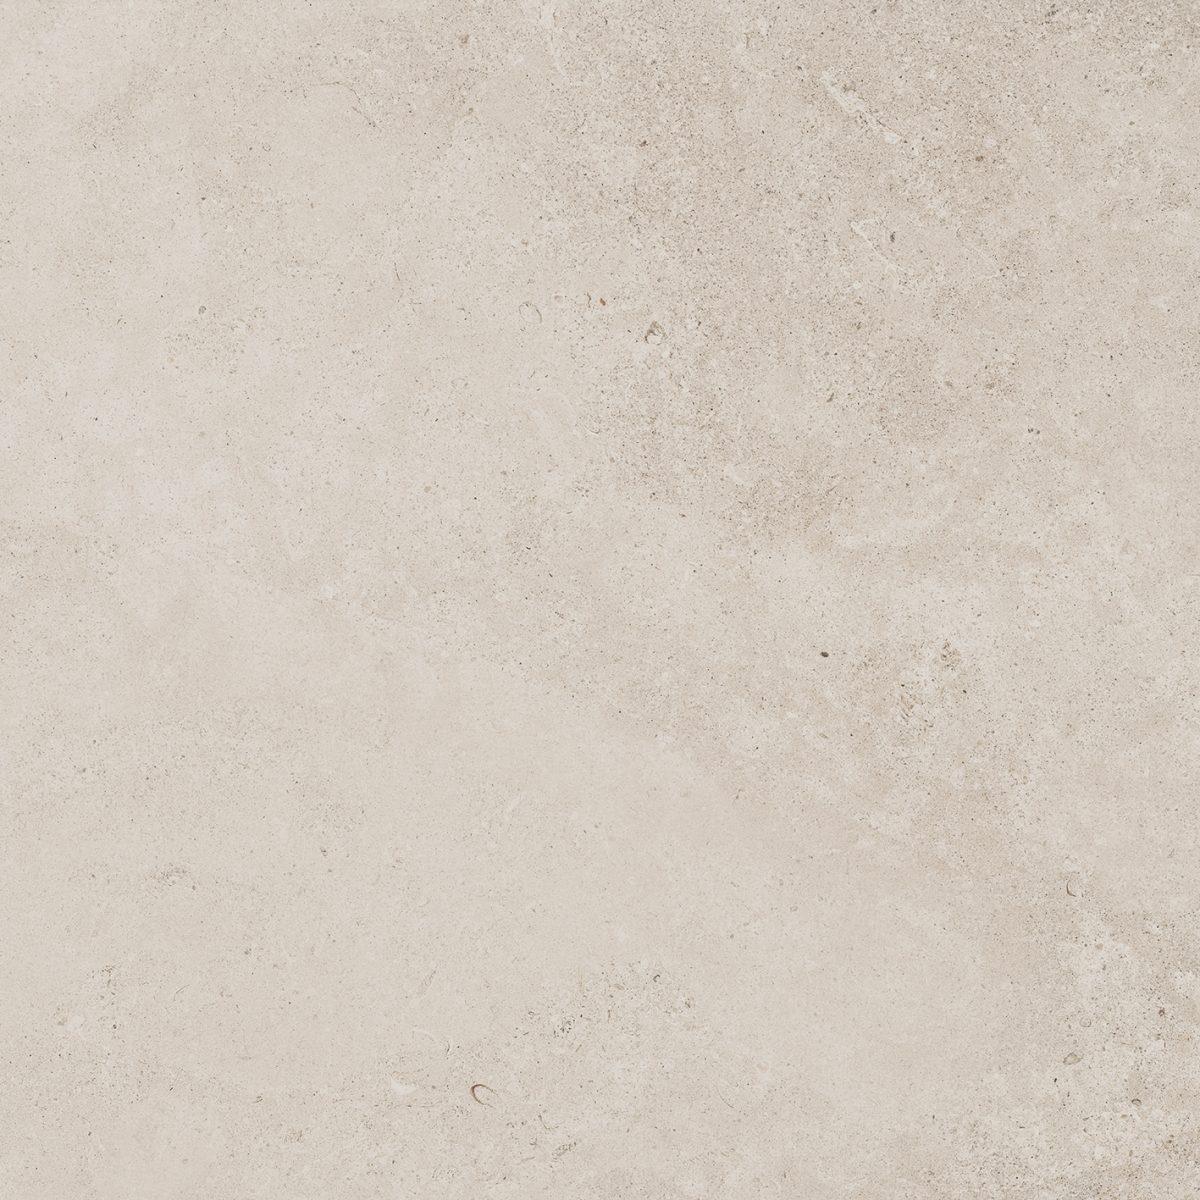 Porcelanosa Berna Caliza Anti-Slip 120 x 120 cm